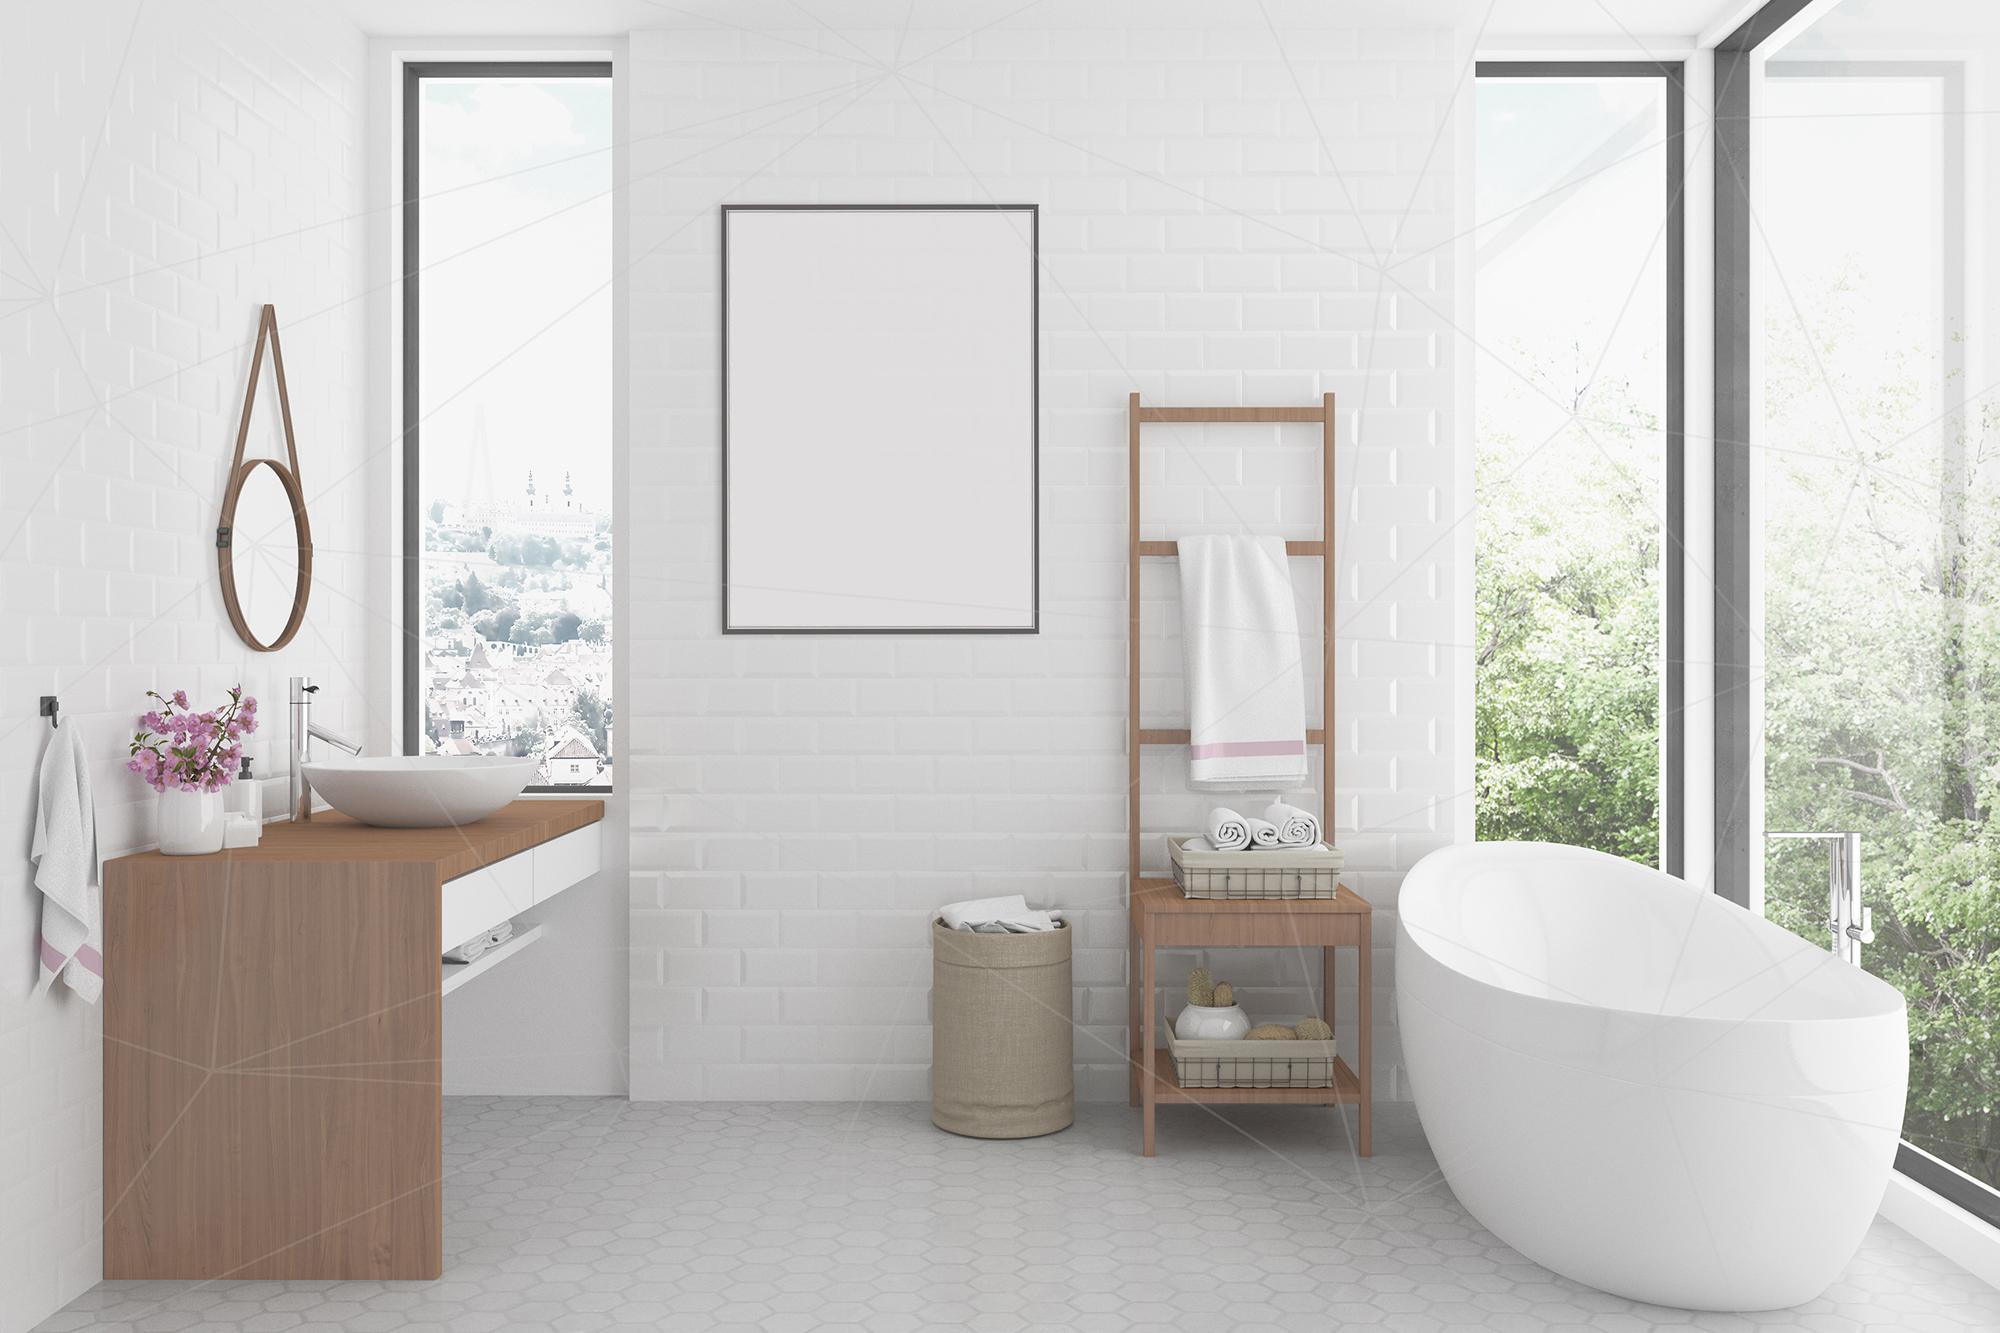 Interior mockup bundle - bathroom background example image 4